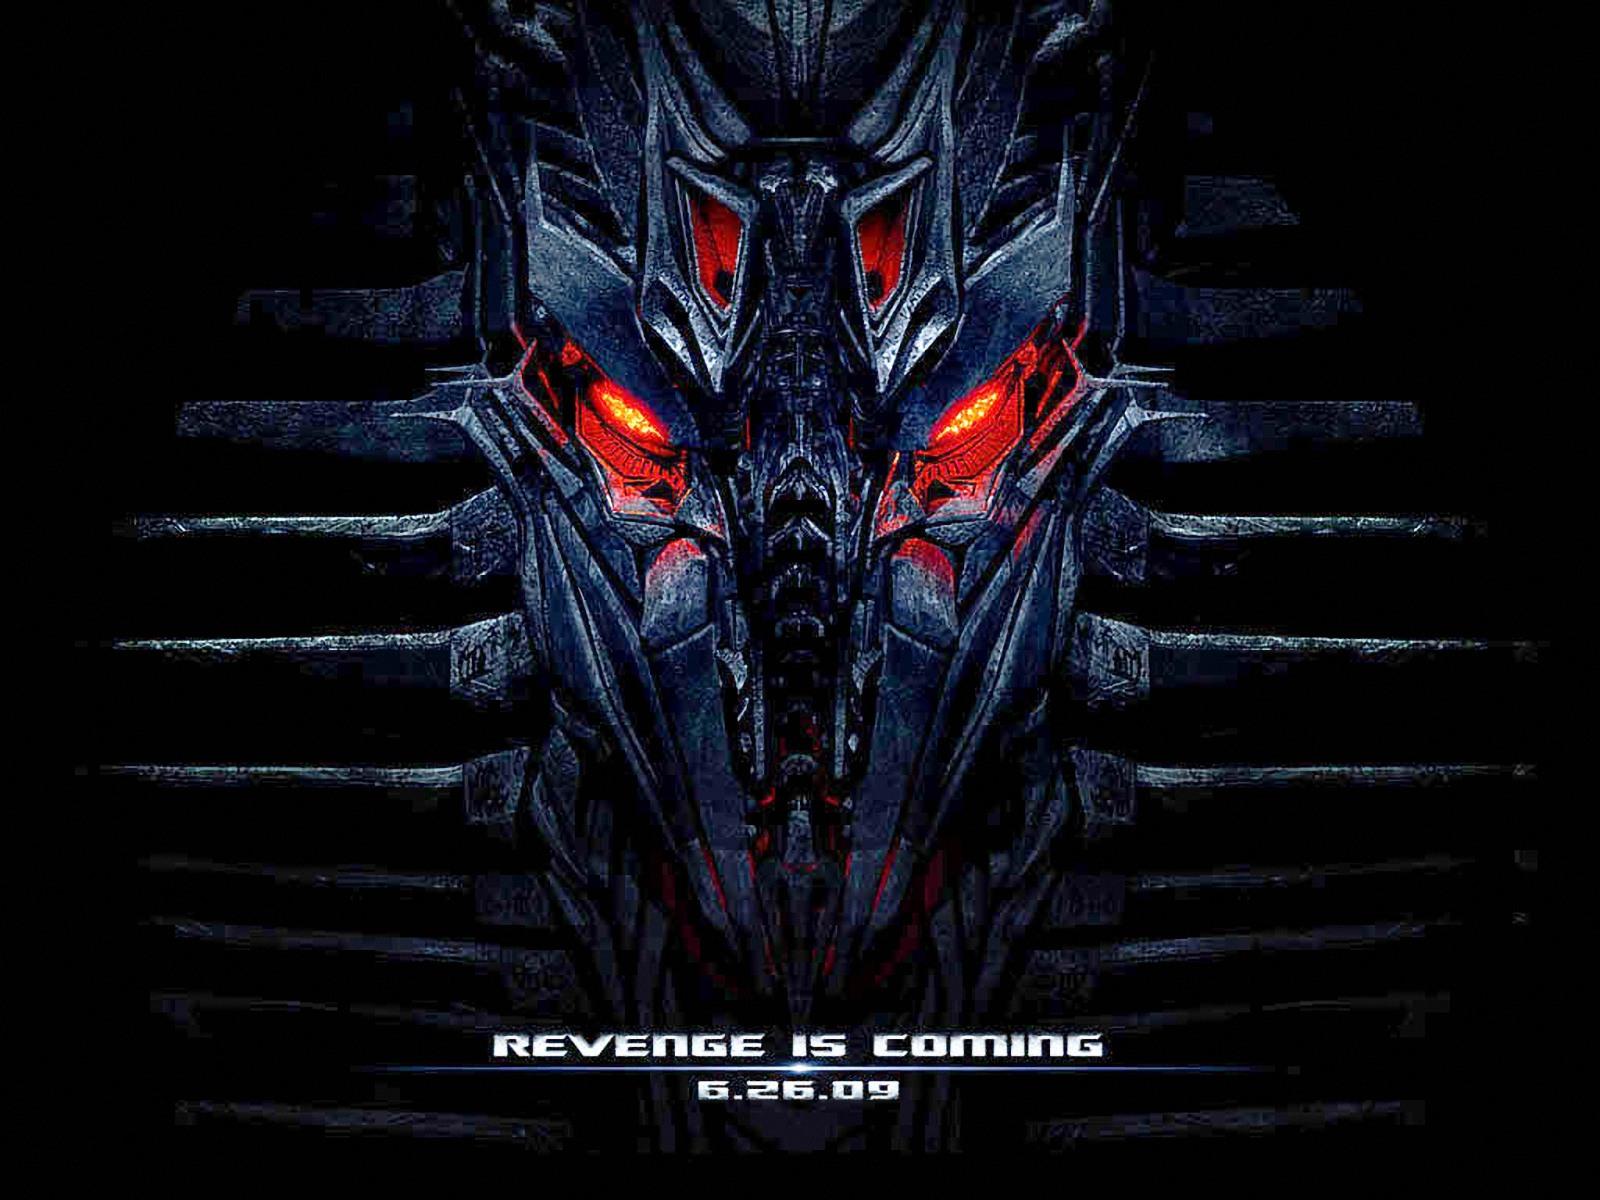 Transformers Revenge Of The Fallen Wallpaper Sf Wallpaper